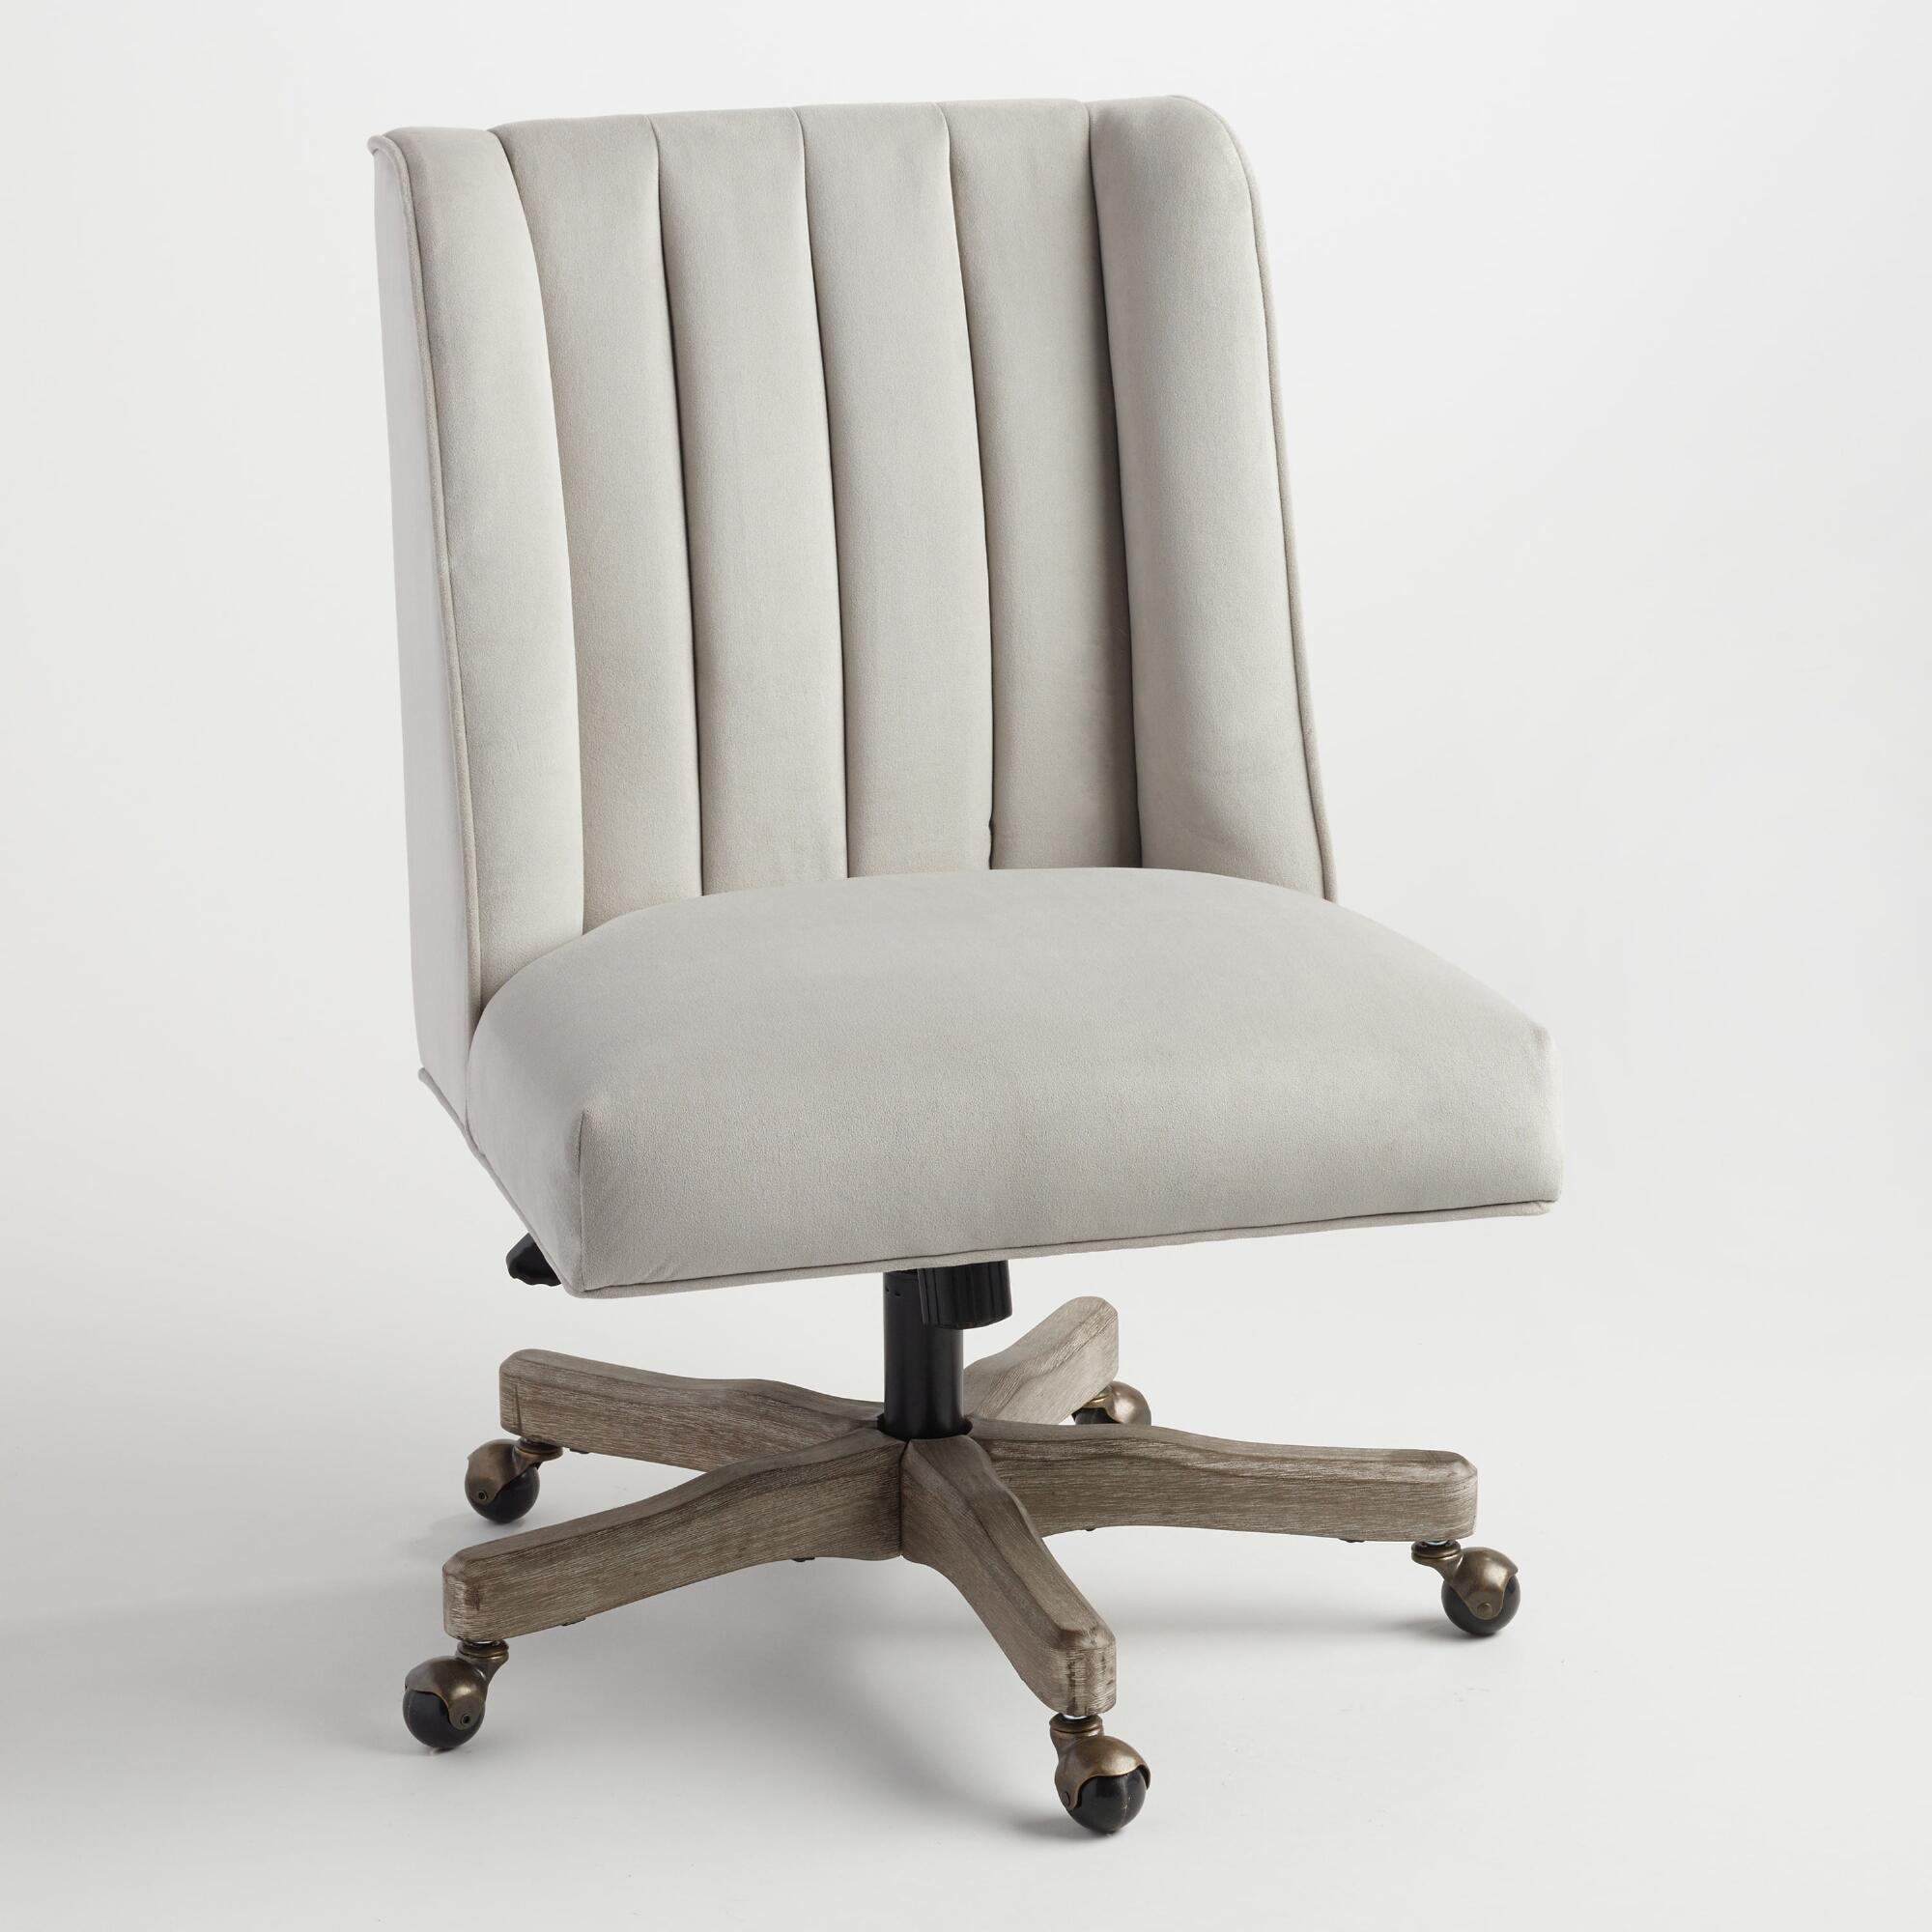 Aluna Upholstered Office Chair Upholstered Desk Chair High Back